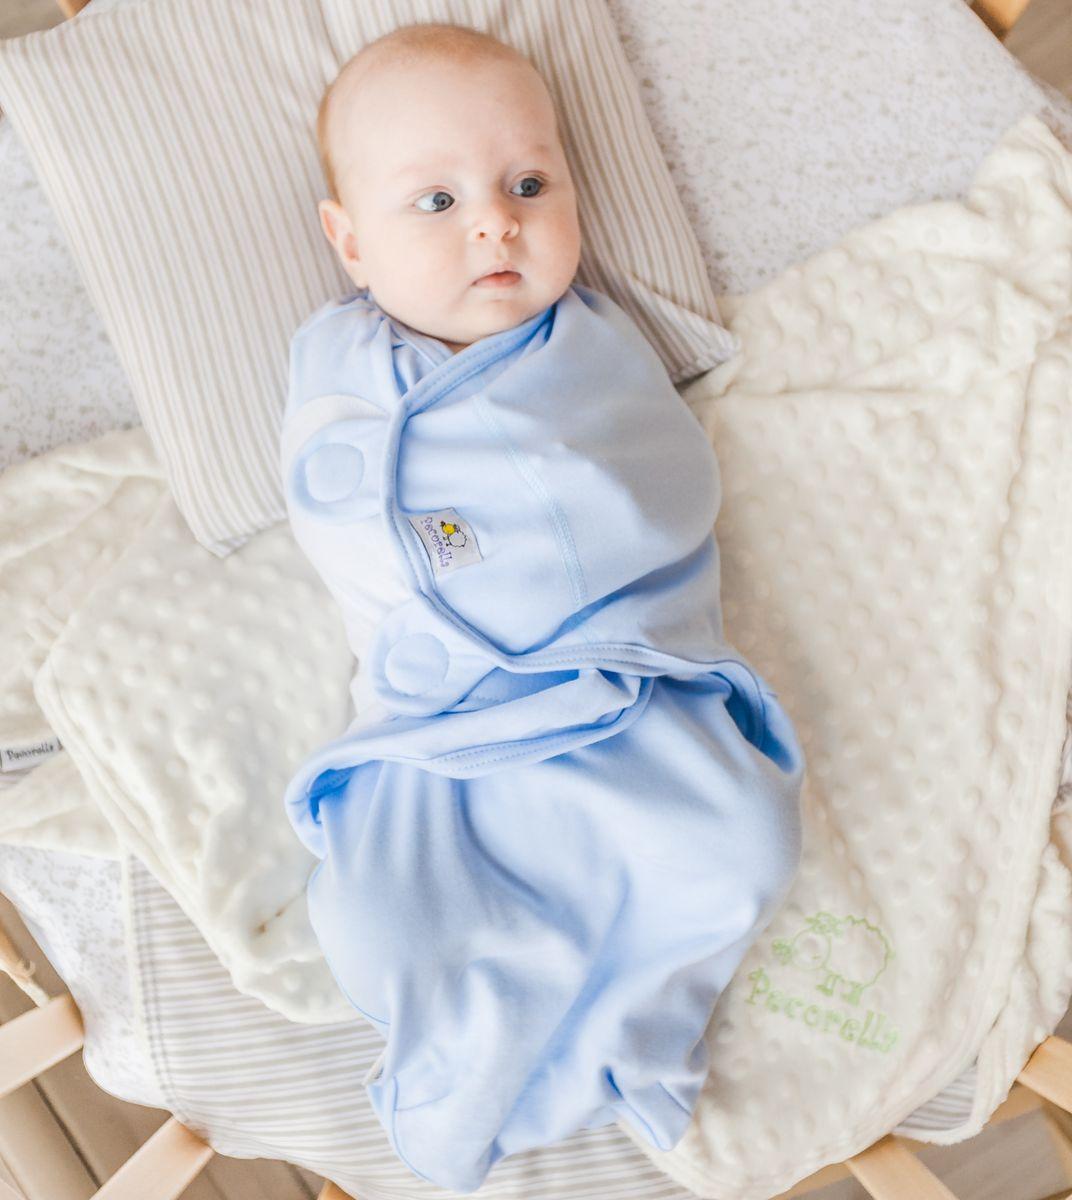 Pecorella Пеленка на липучках SwaddleFun Ocean Blue Размер L 4,5-8,5 кг - Подгузники и пеленки